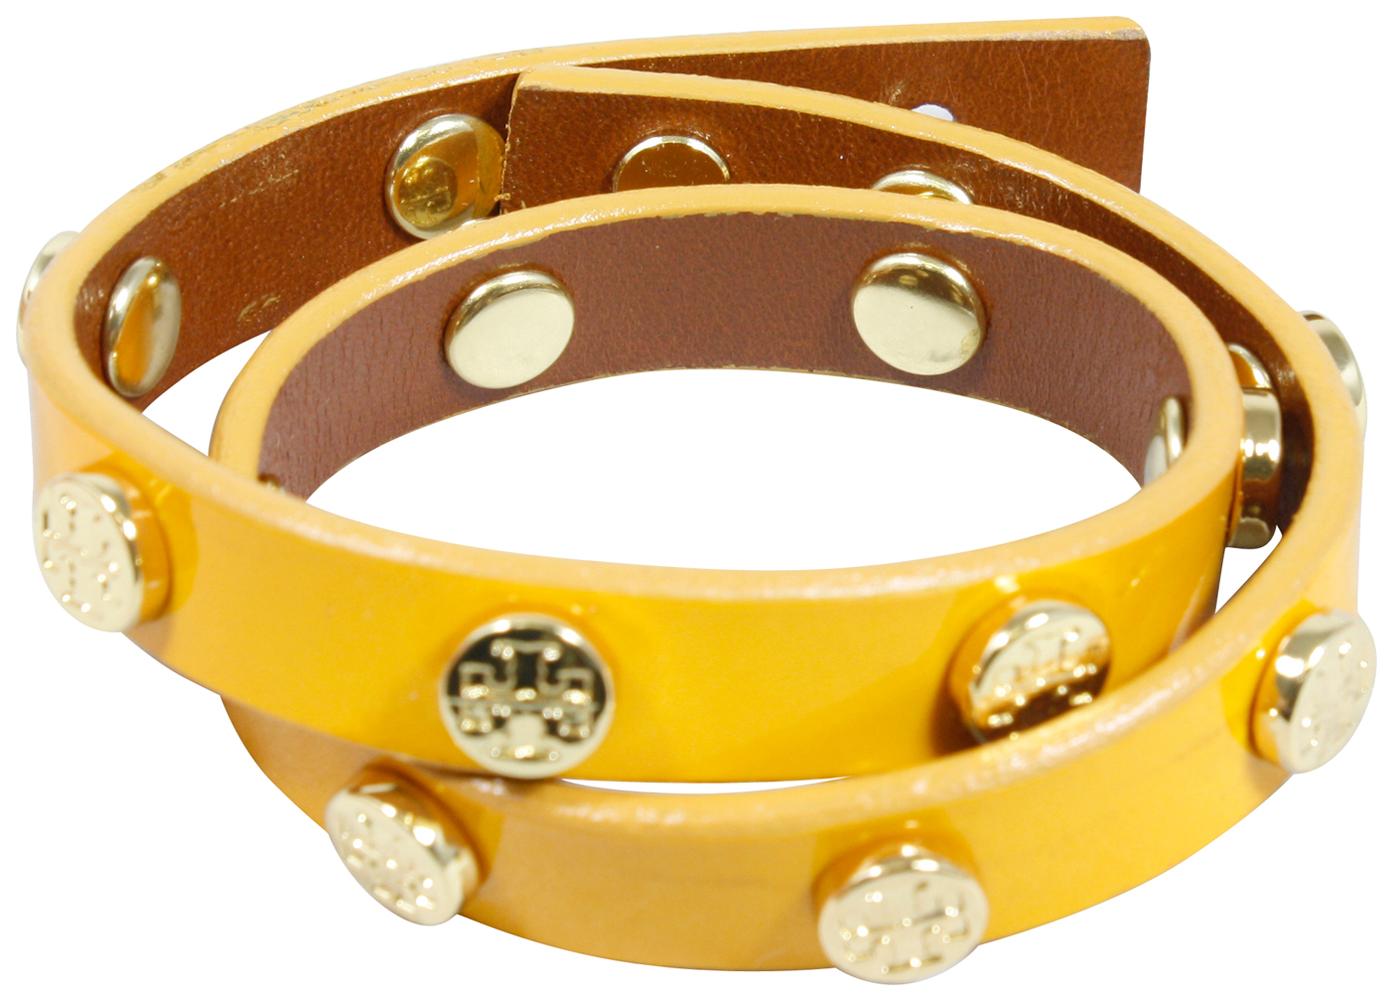 Tory Burch Studded Leather Wrap Bracelet Gold Logo Lemon Jewelry New